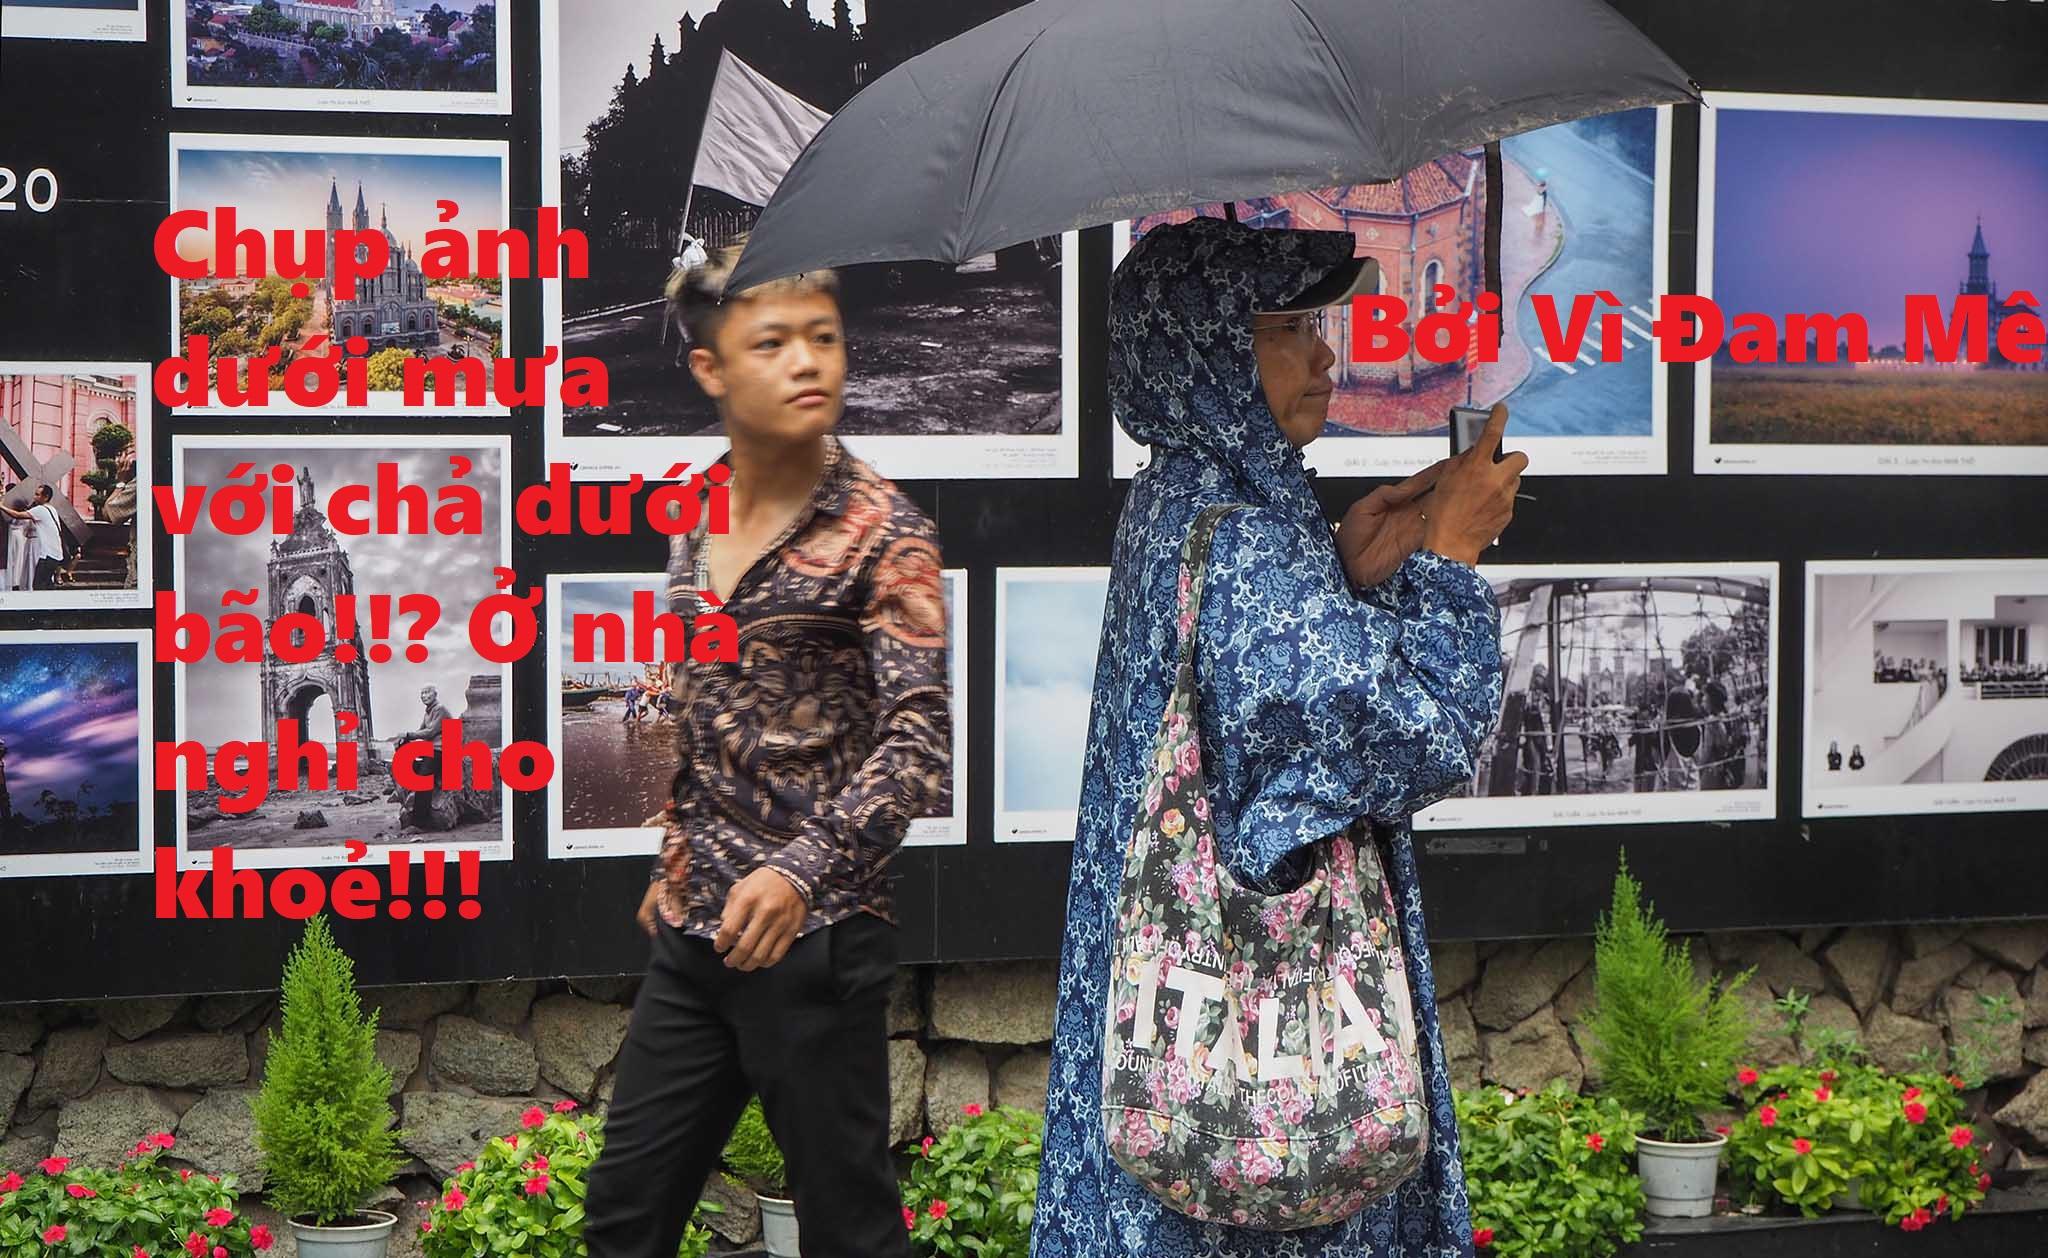 mưa.jpg